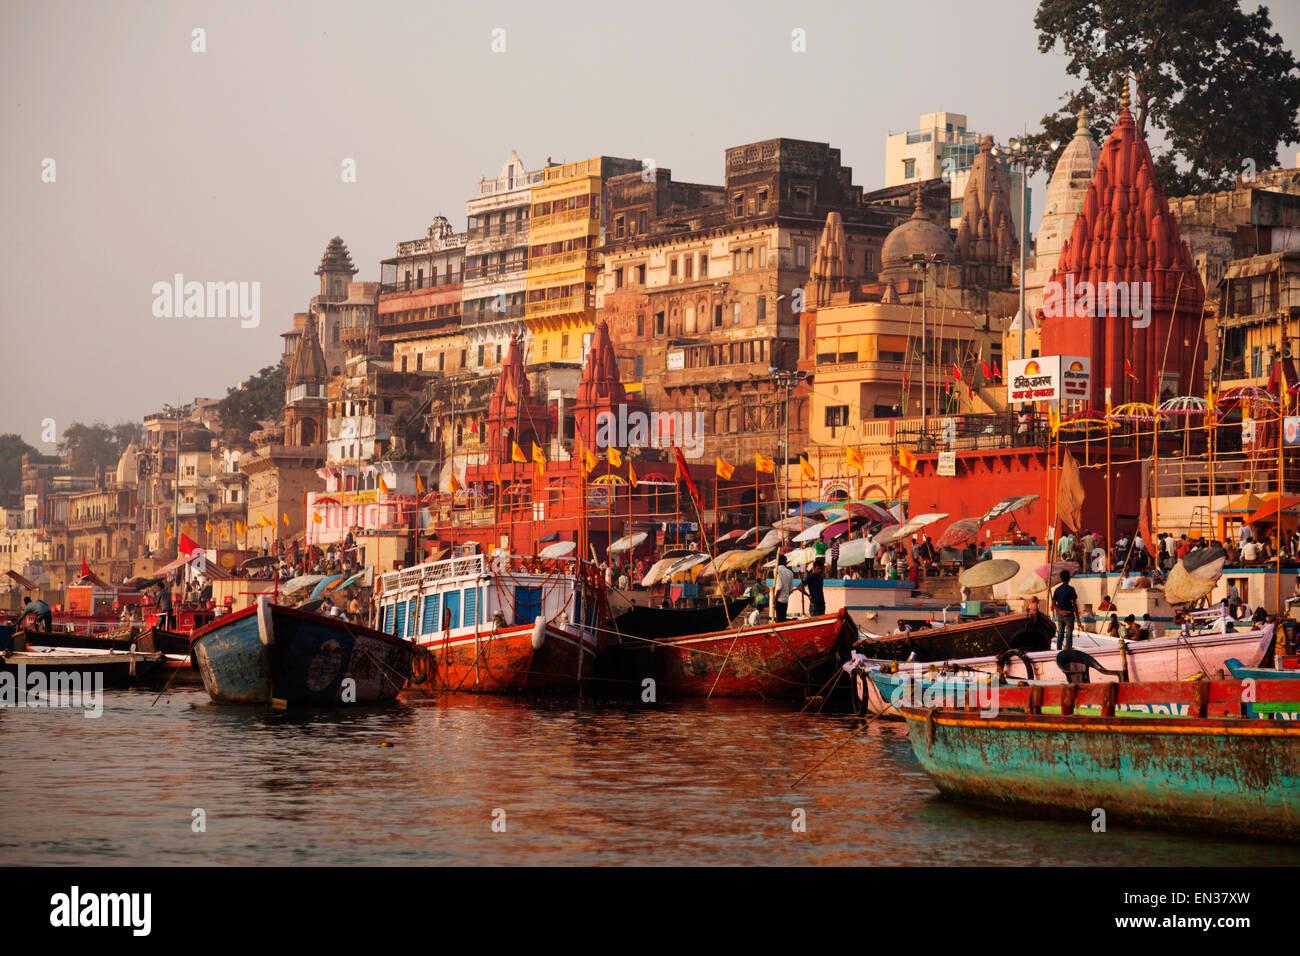 Ghats, bateaux et le Gange, Varanasi, Uttar Pradesh, Inde Photo Stock